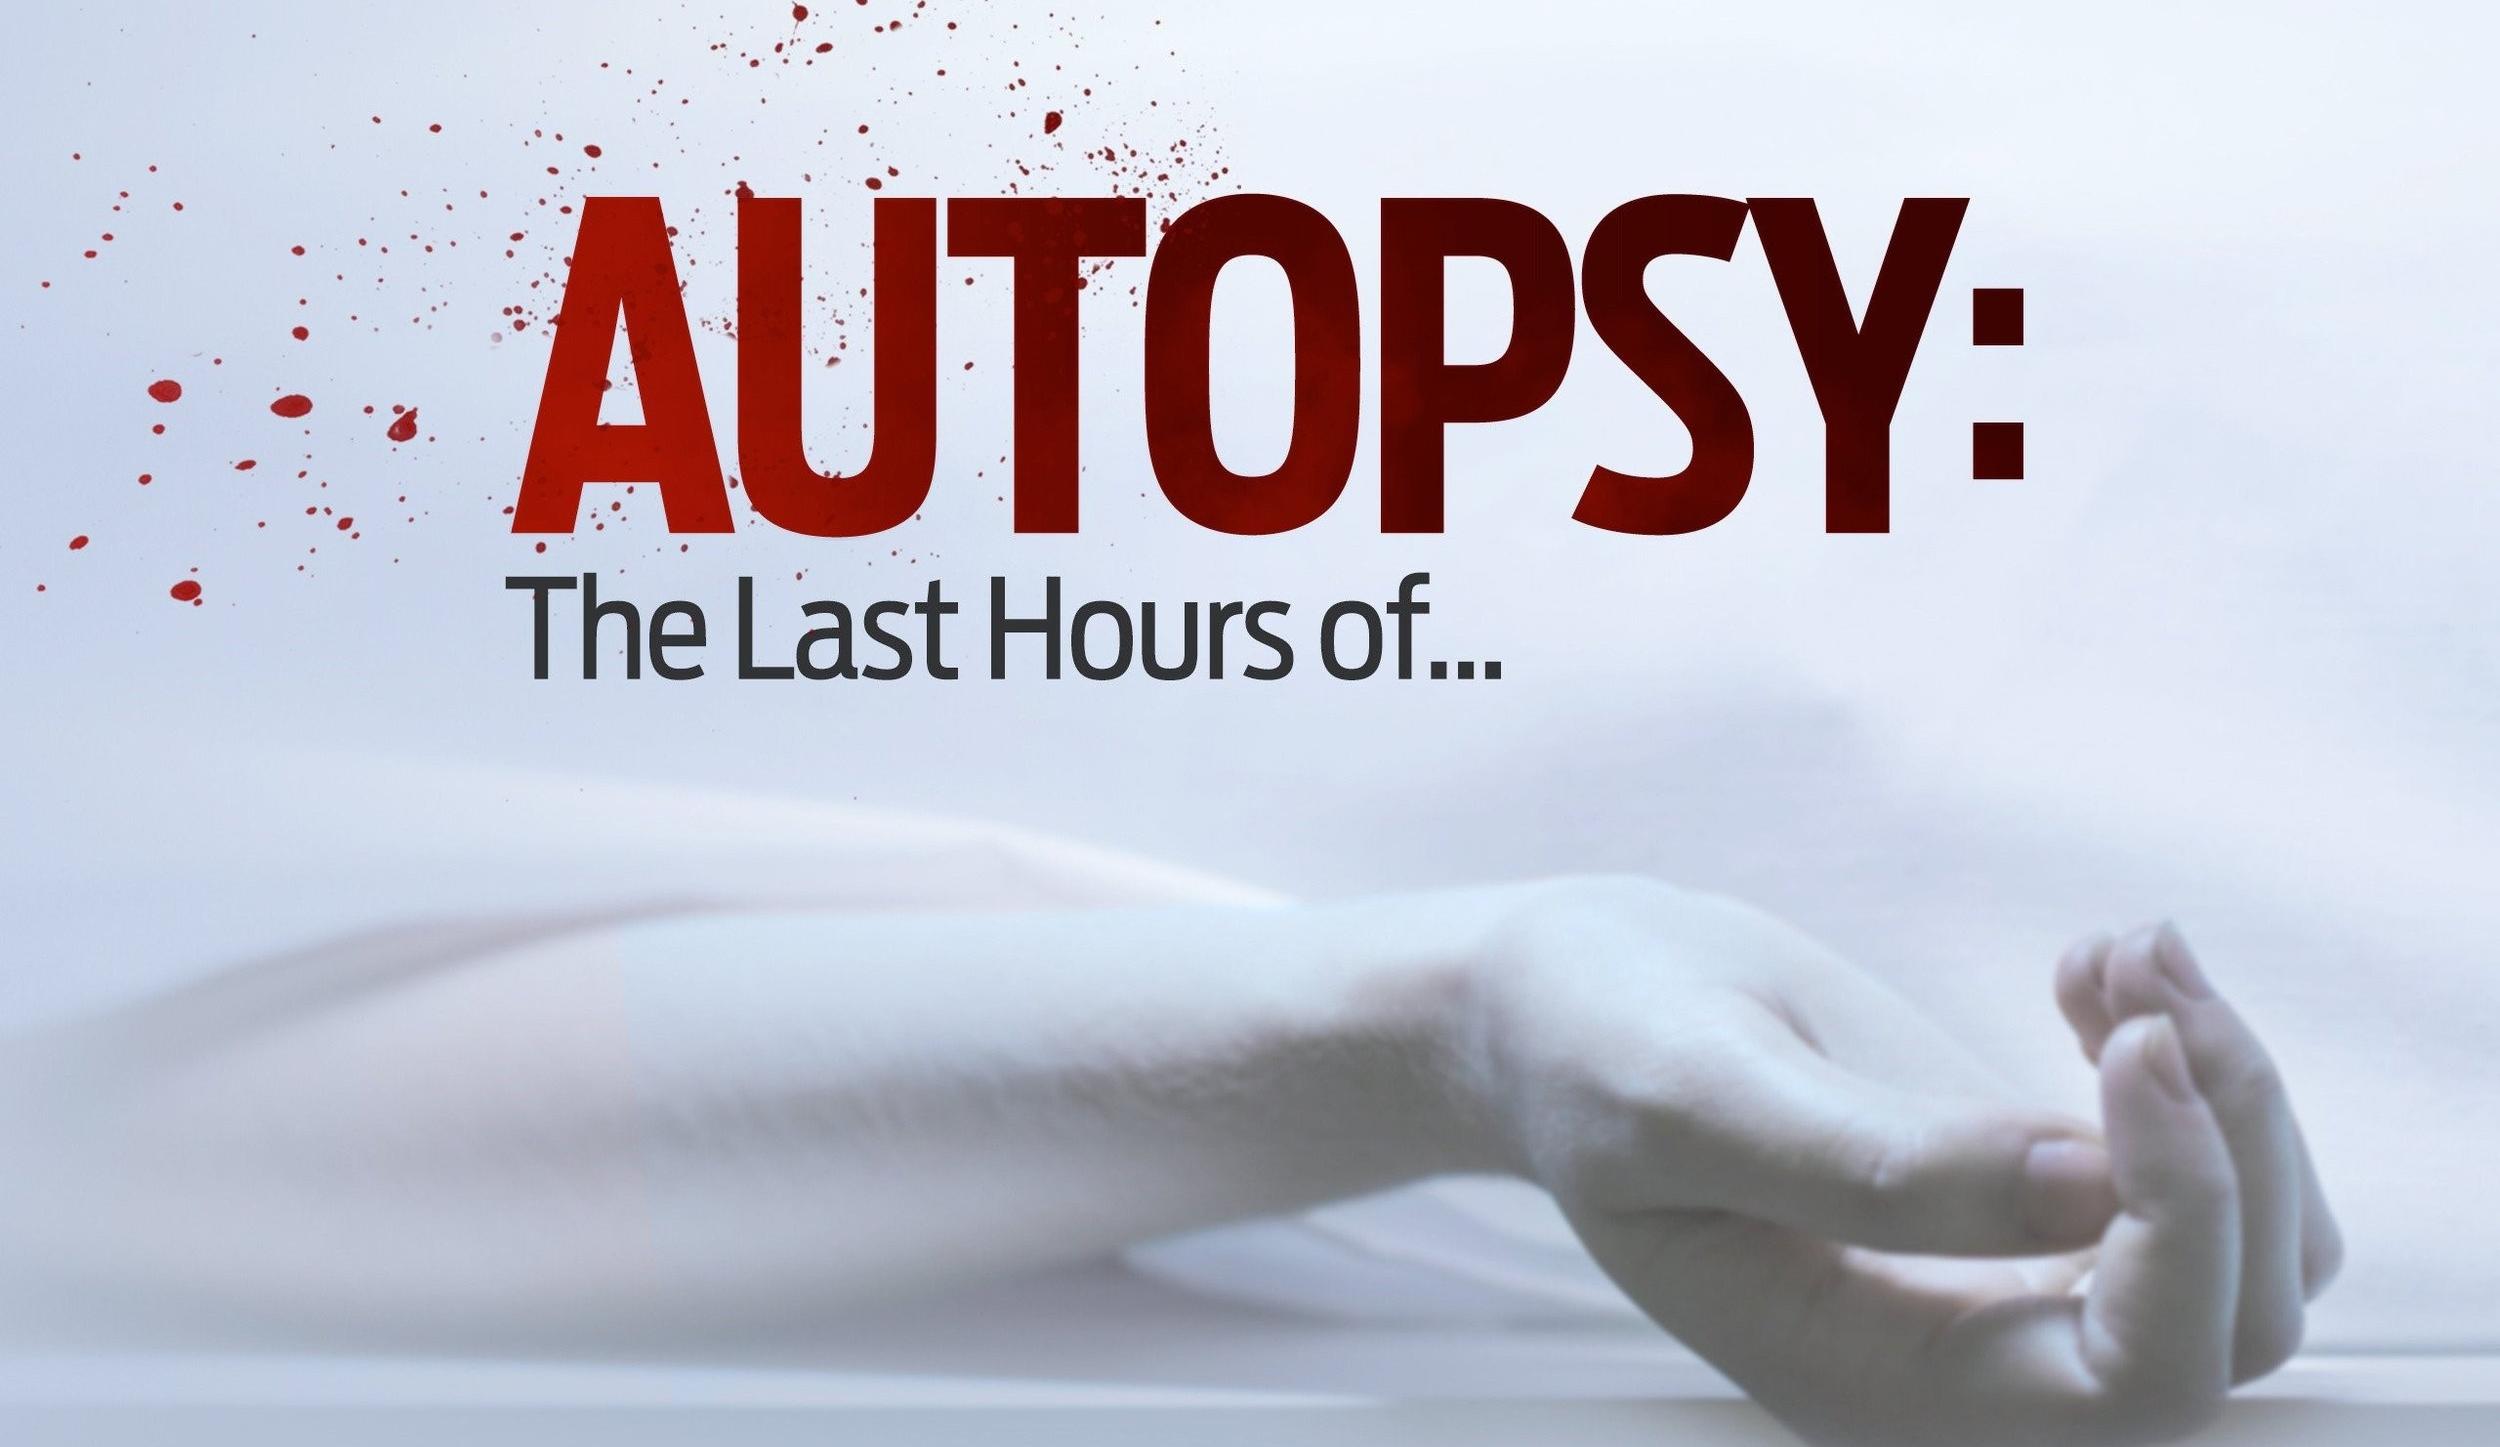 autopsy_cropped.jpg